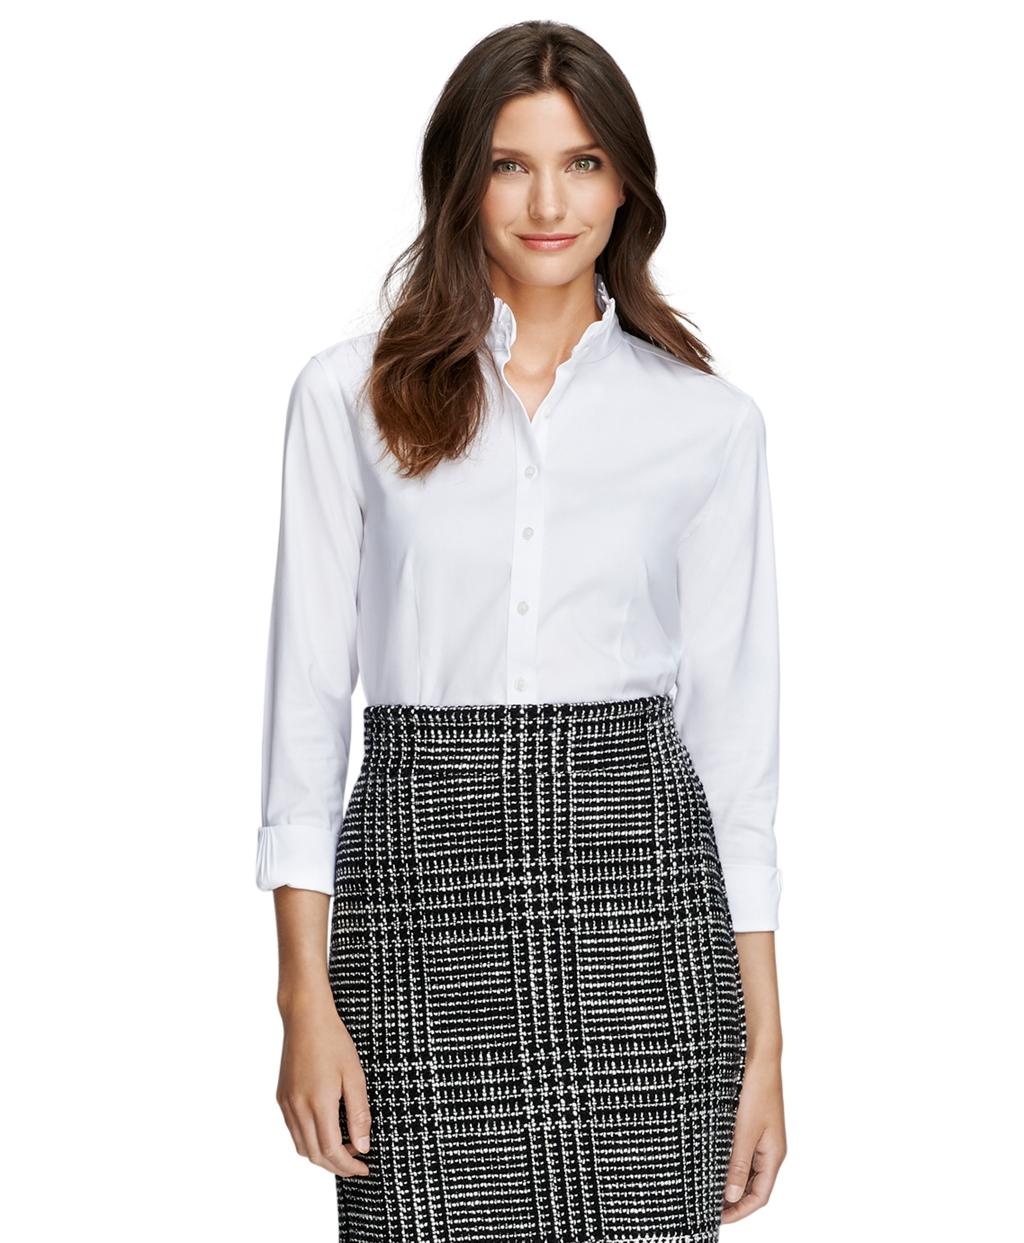 39aa1ed908c Lyst - Brooks Brothers Non-iron Tailored Fit Ruffle Collar Dress ...